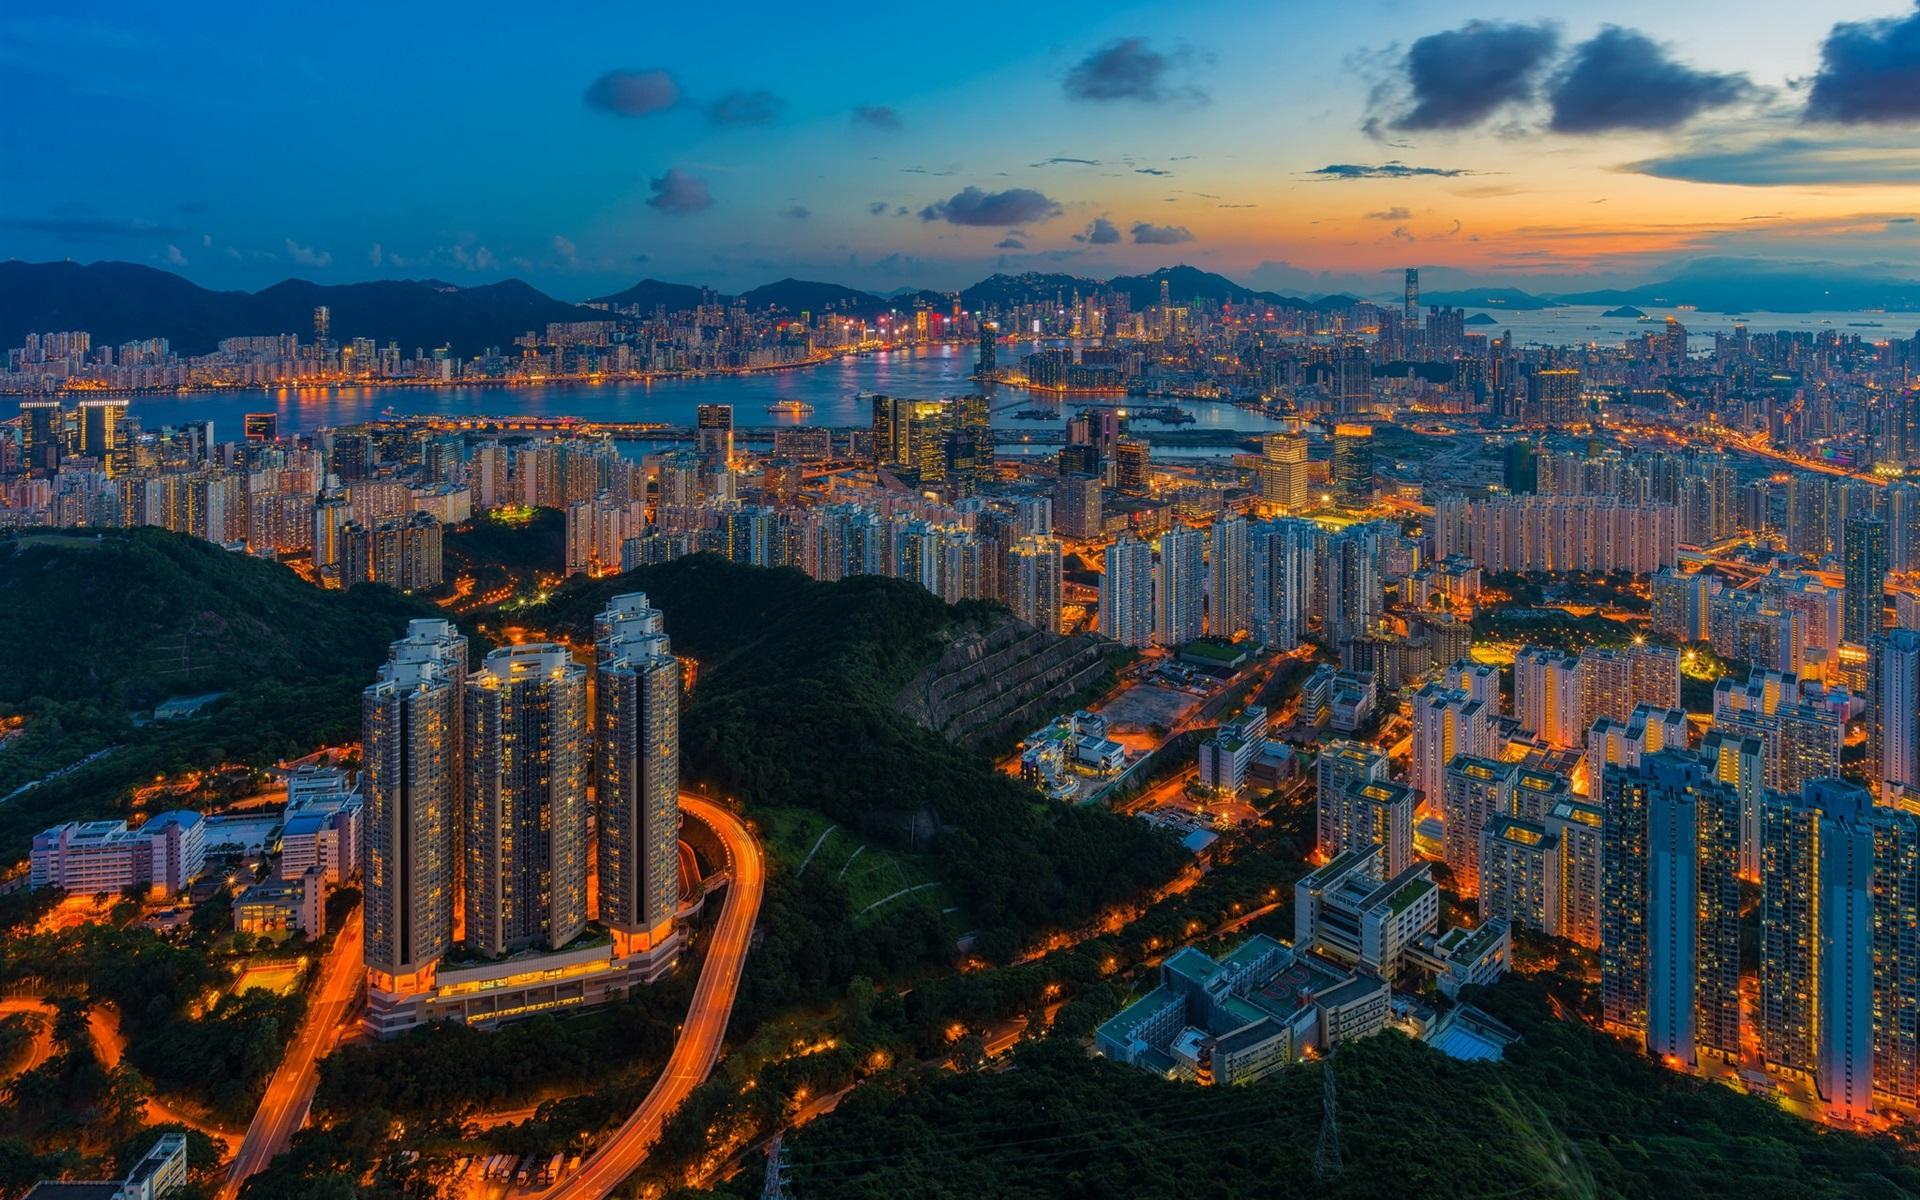 Wallpaper Hong Kong Skyscrapers Lights City Night Top View